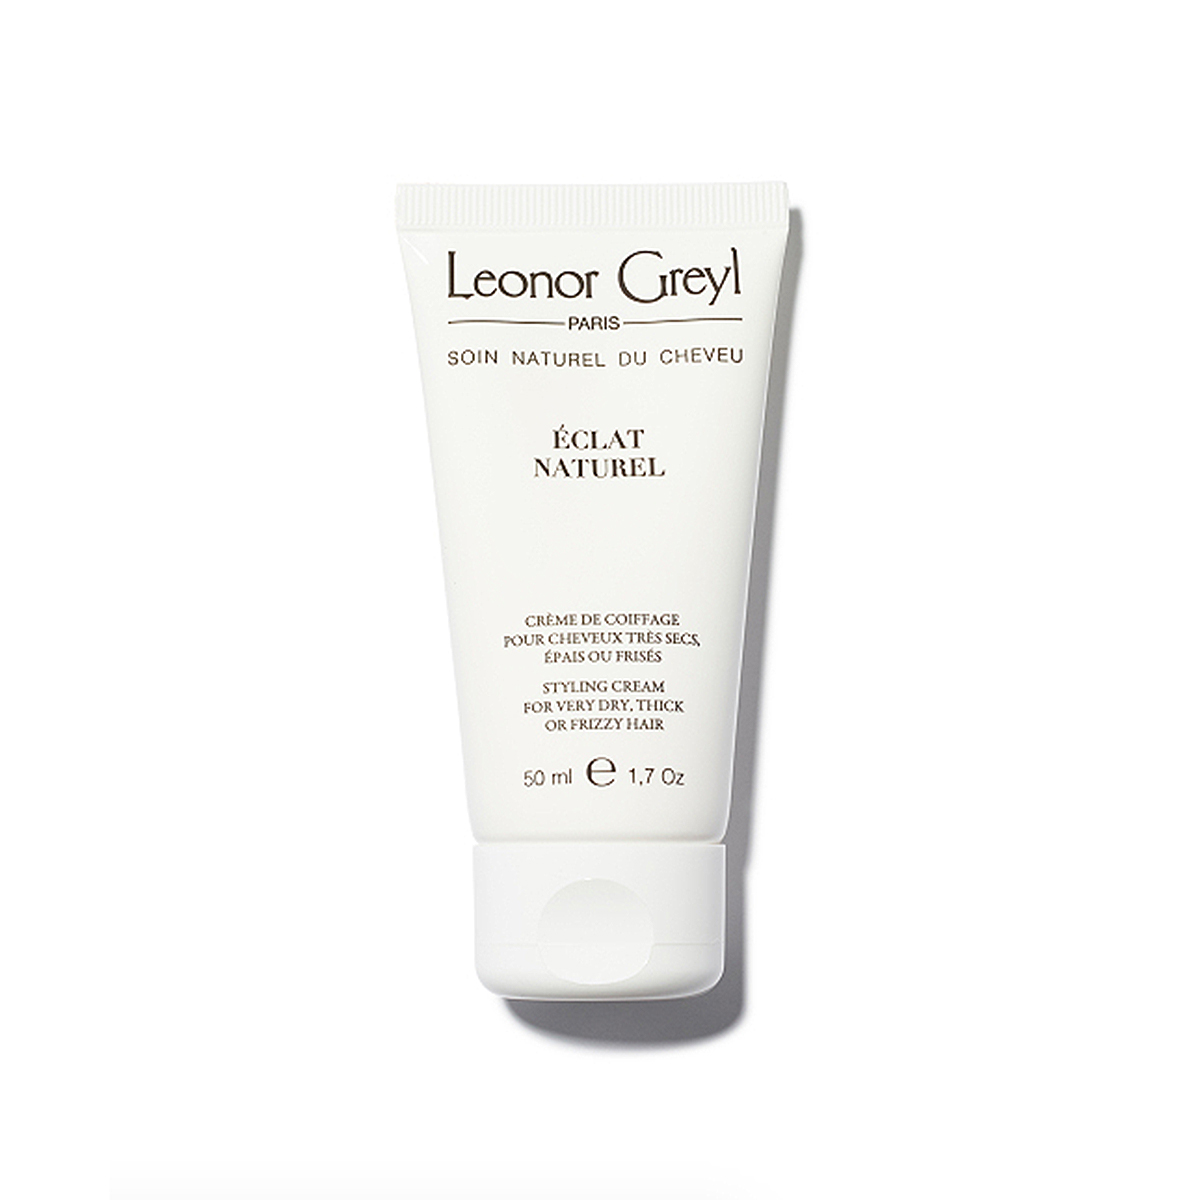 leonor-greyl-eclat-naturel